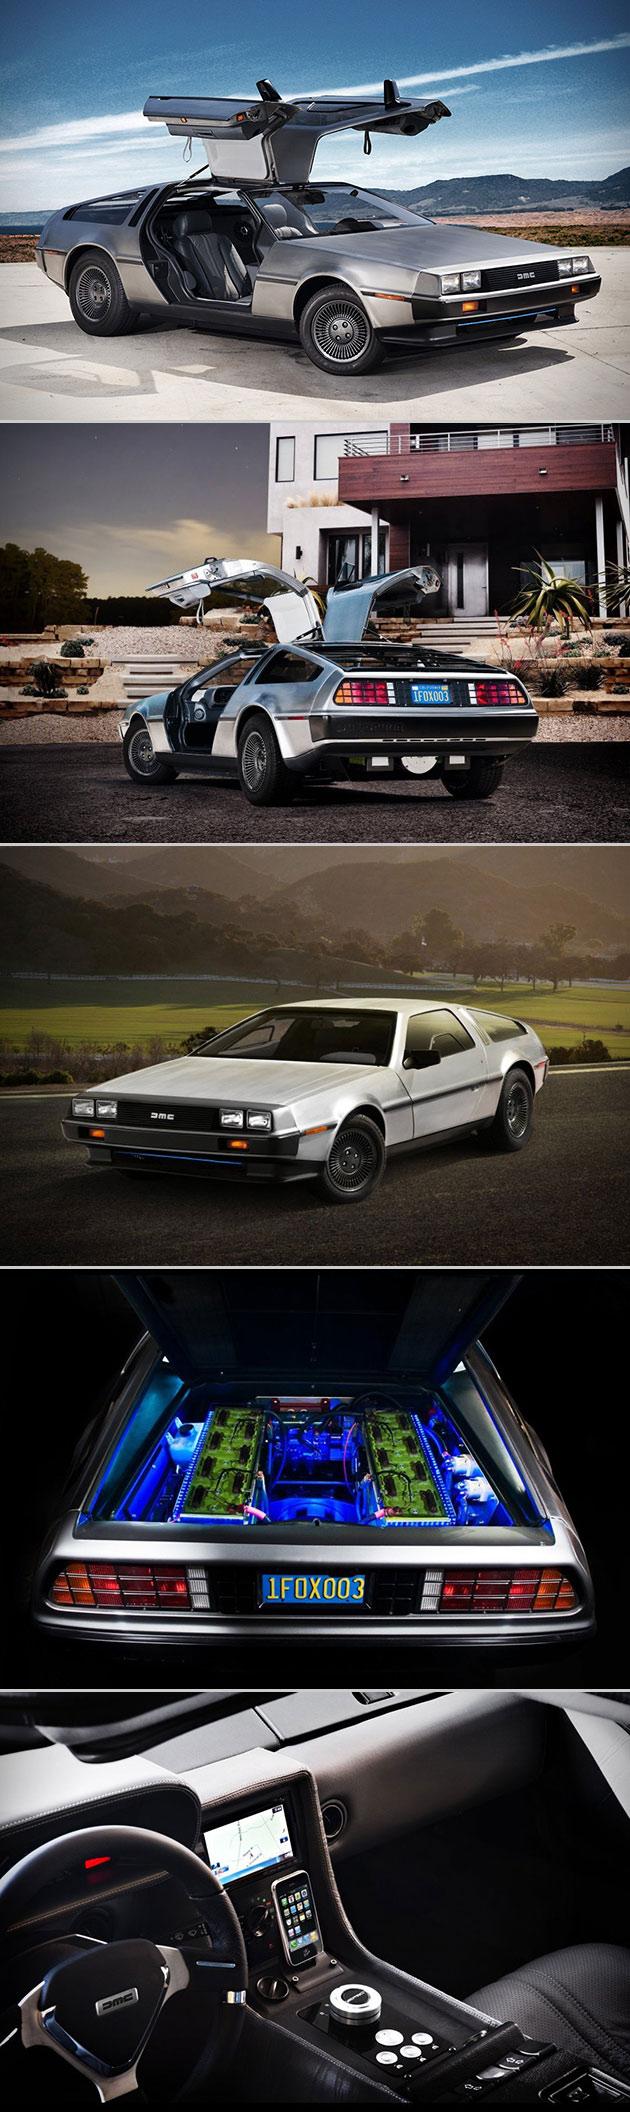 Full Electric DeLorean